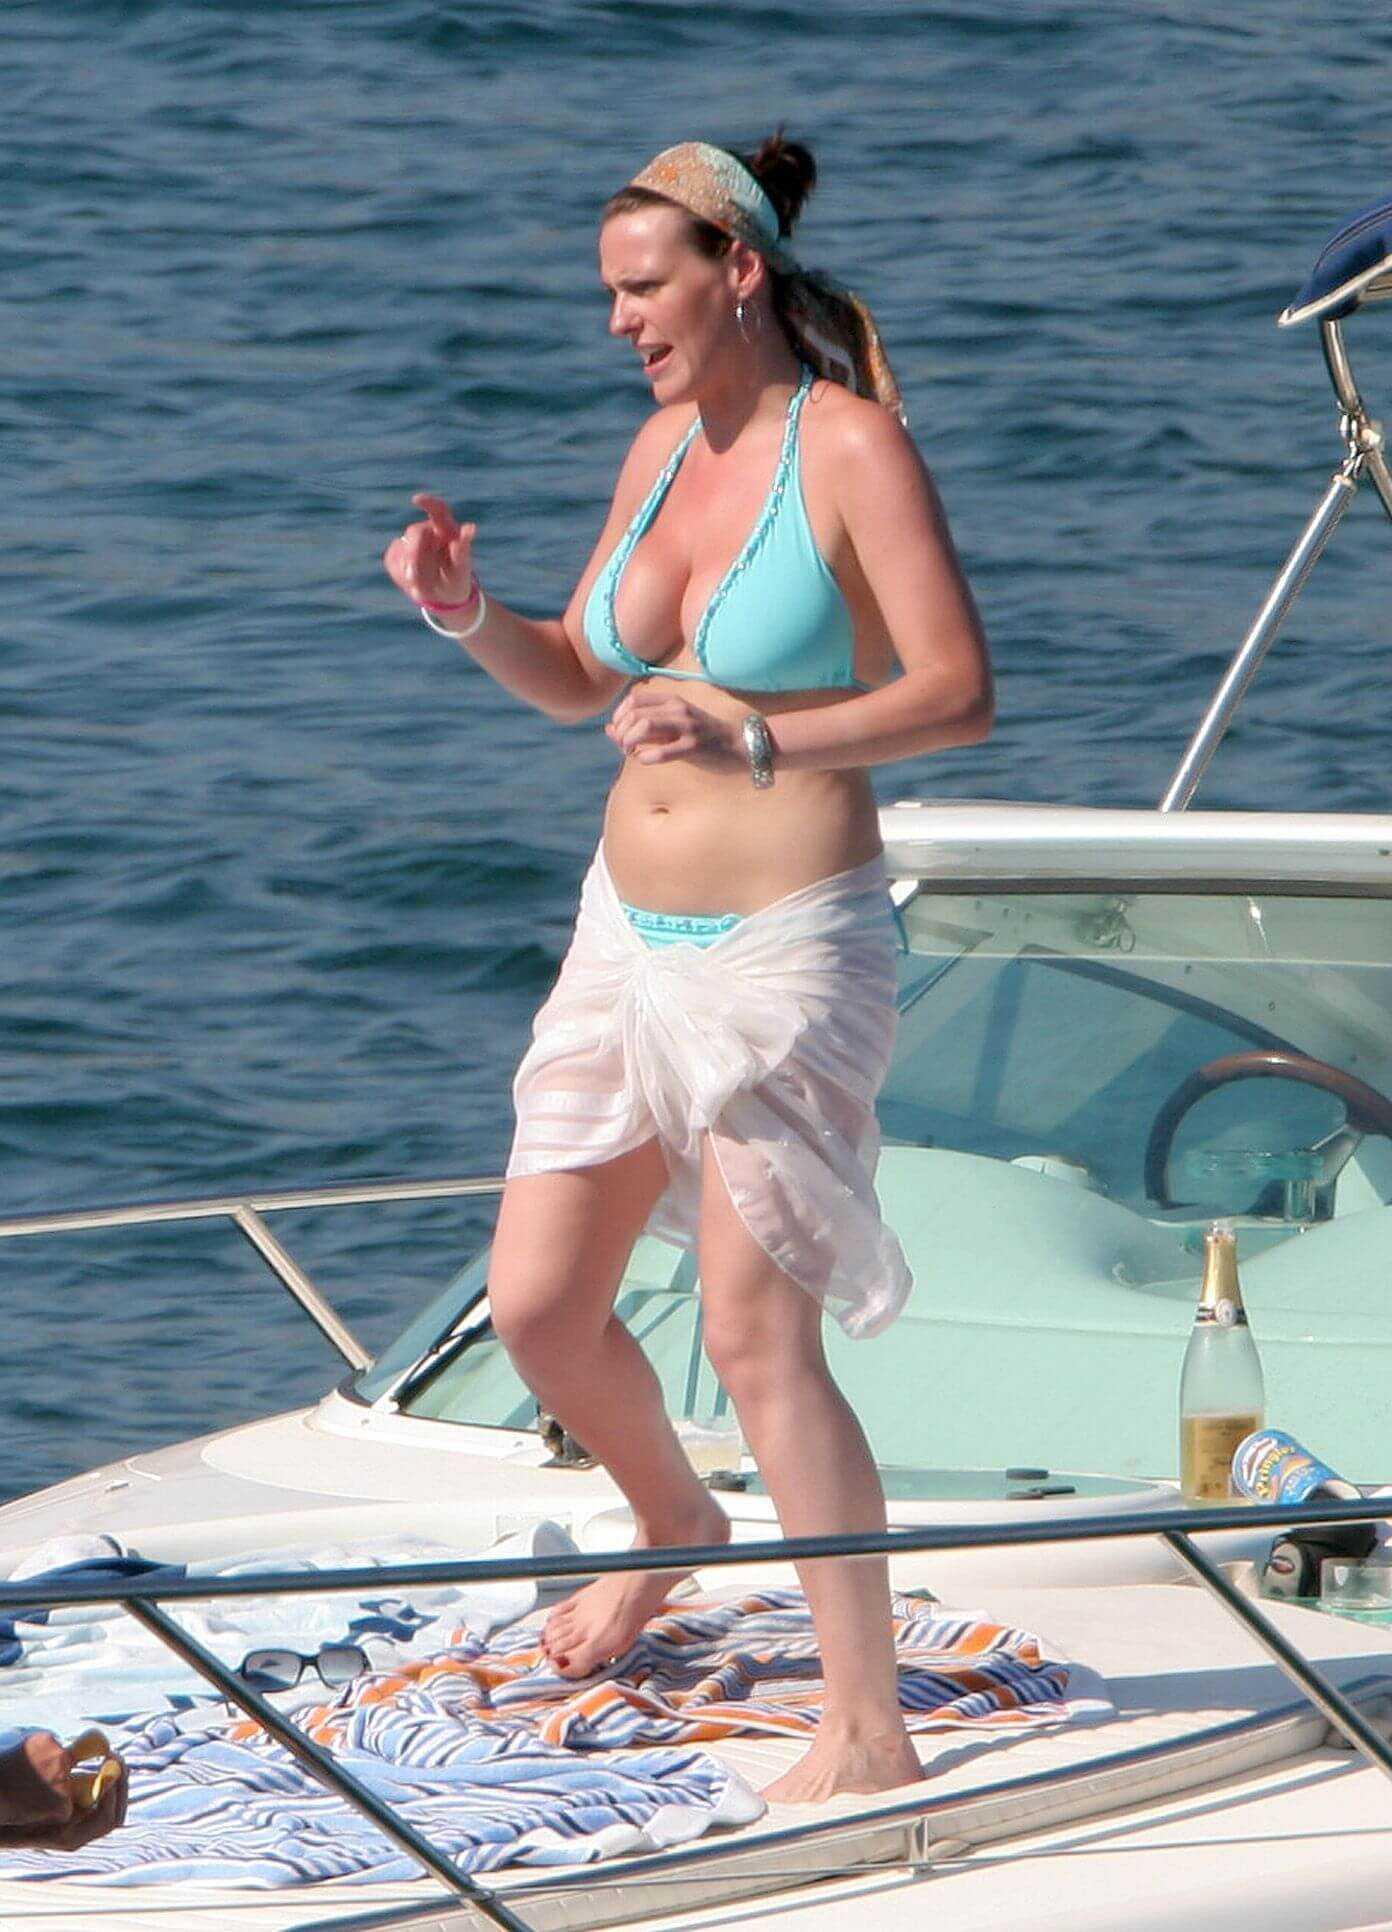 Suranne Jones bikini pictures